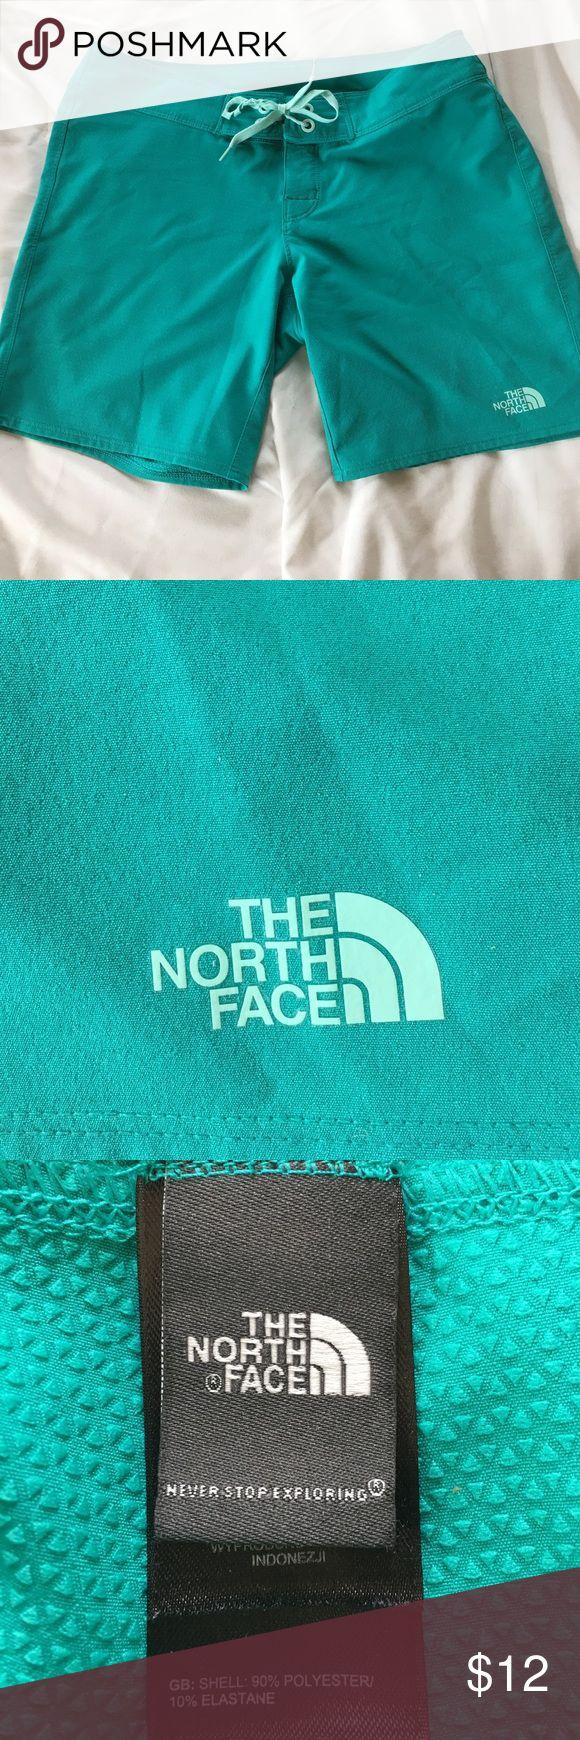 North face women's green shorts North face women's green shorts - size 4. Drawstring/Velcro close at waist near drawstring. North Face Shorts